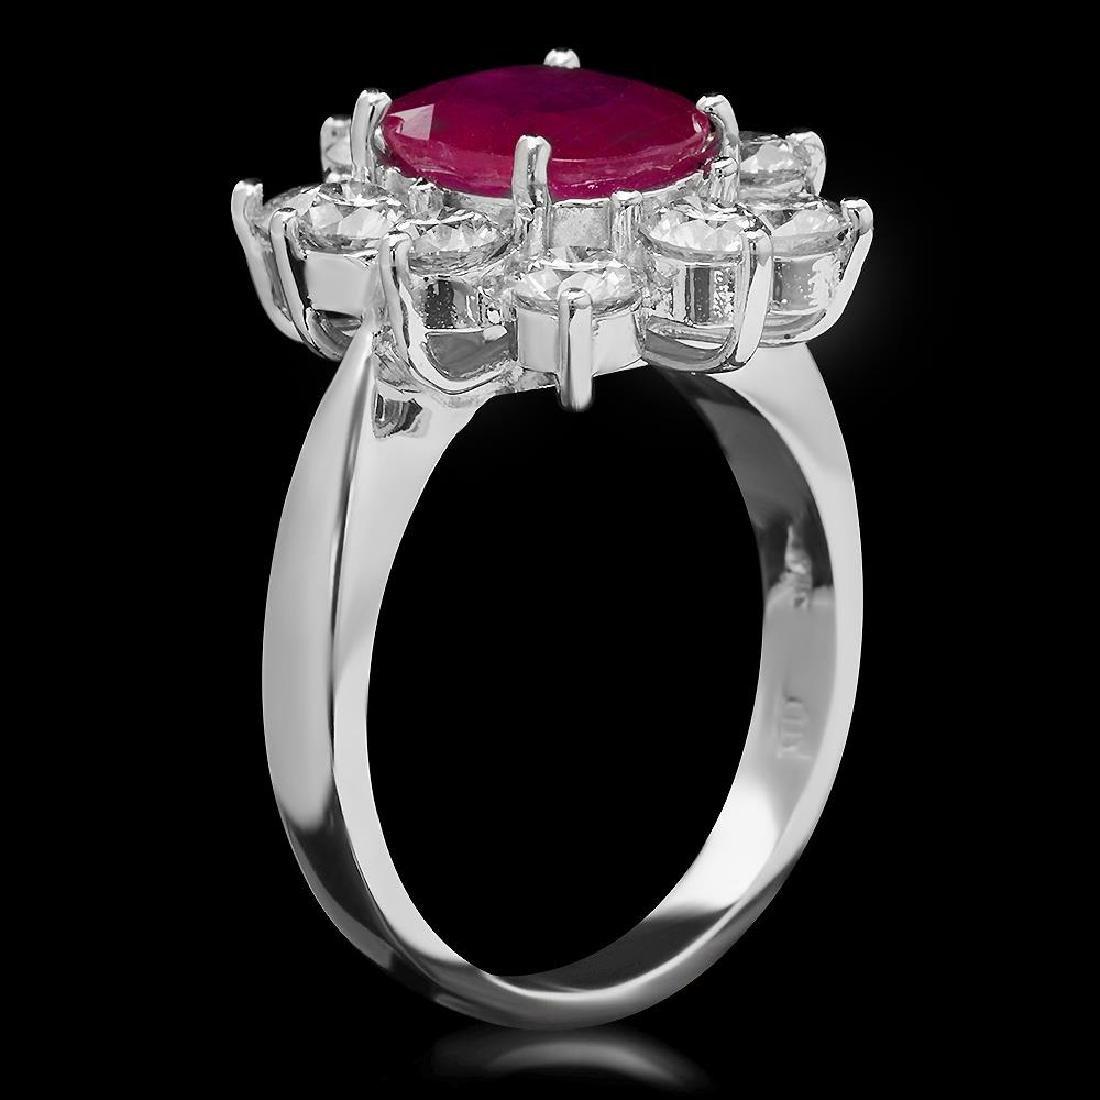 14K Gold 2.95ct Ruby & 2.20ct Diamond Ring - 2